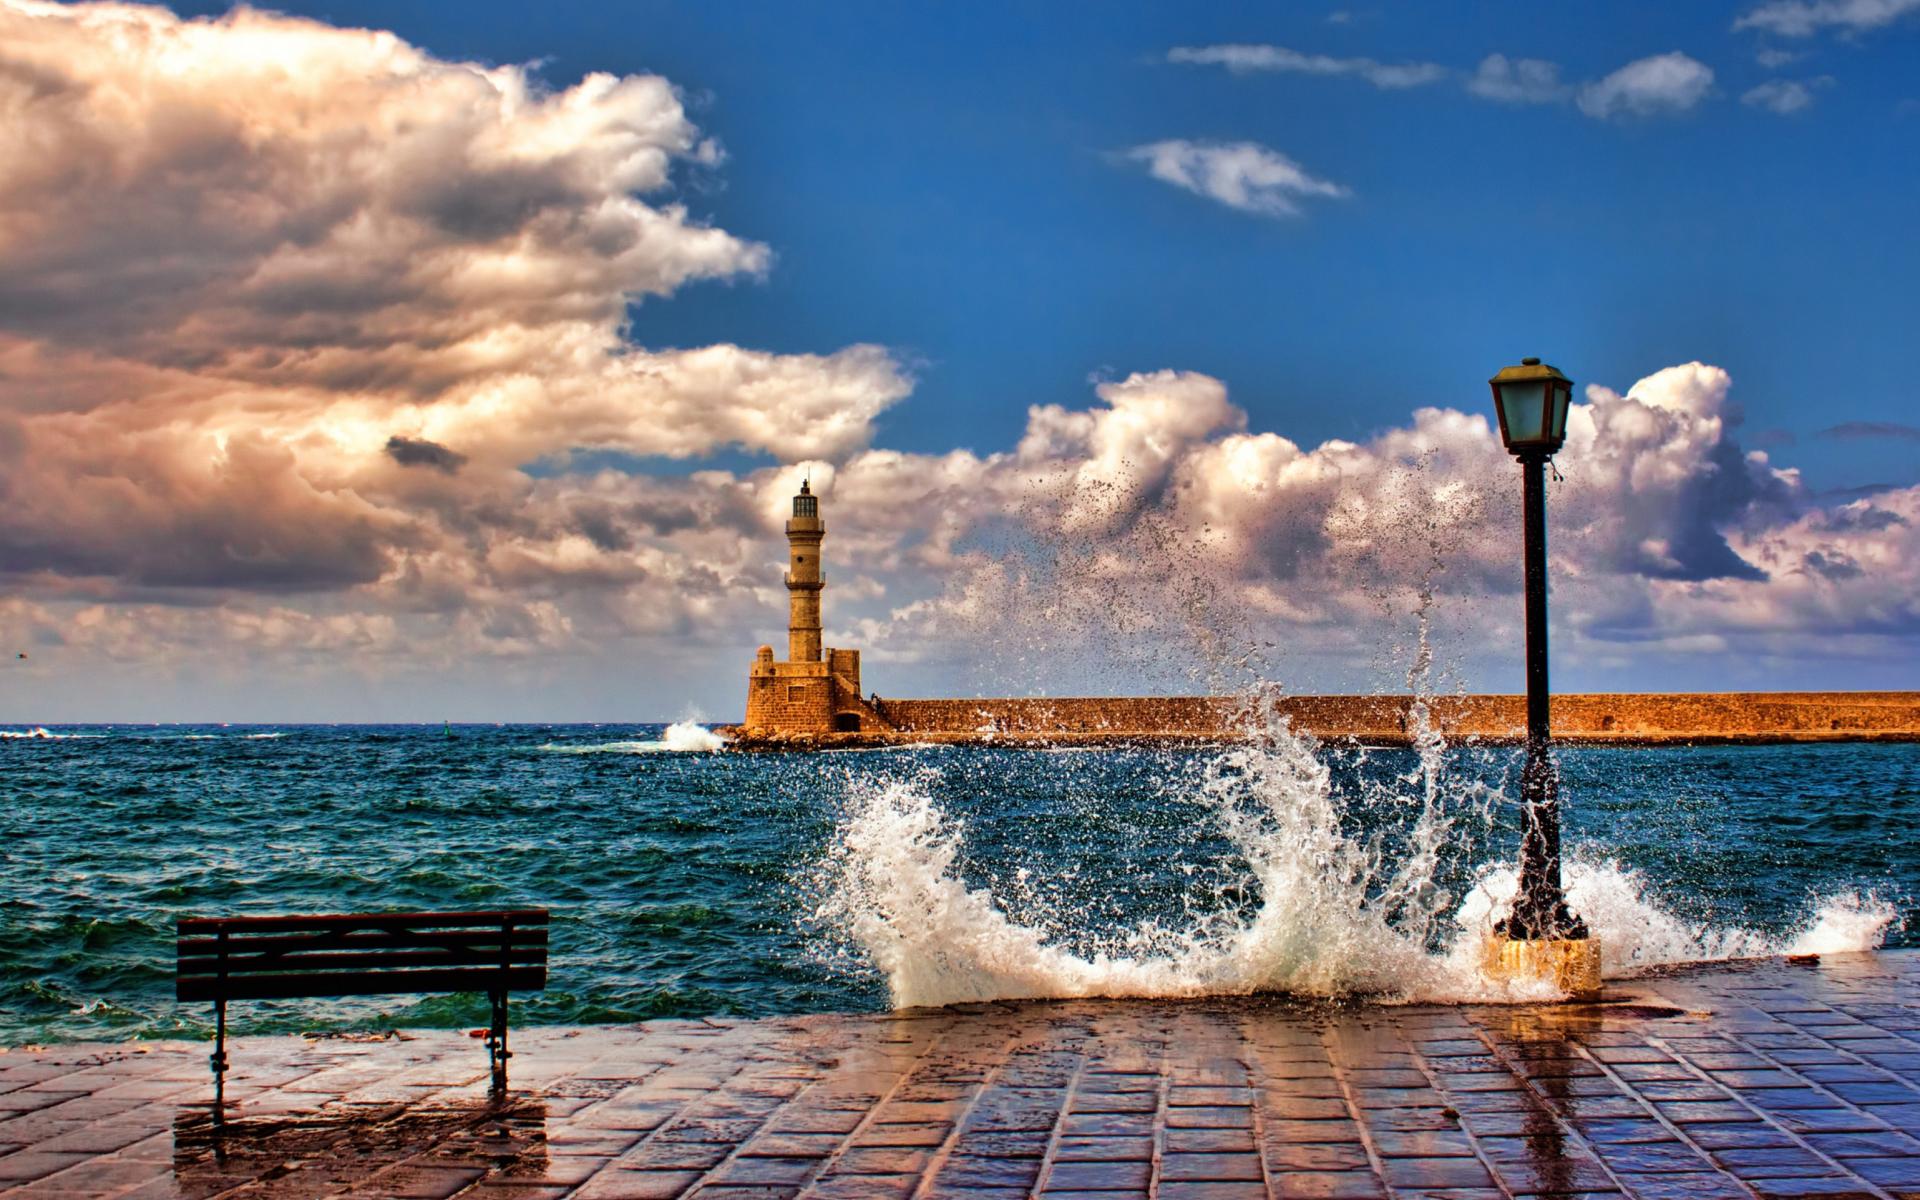 Lighthouse In Greece para Widescreen Desktop PC 1920x1080 Full HD